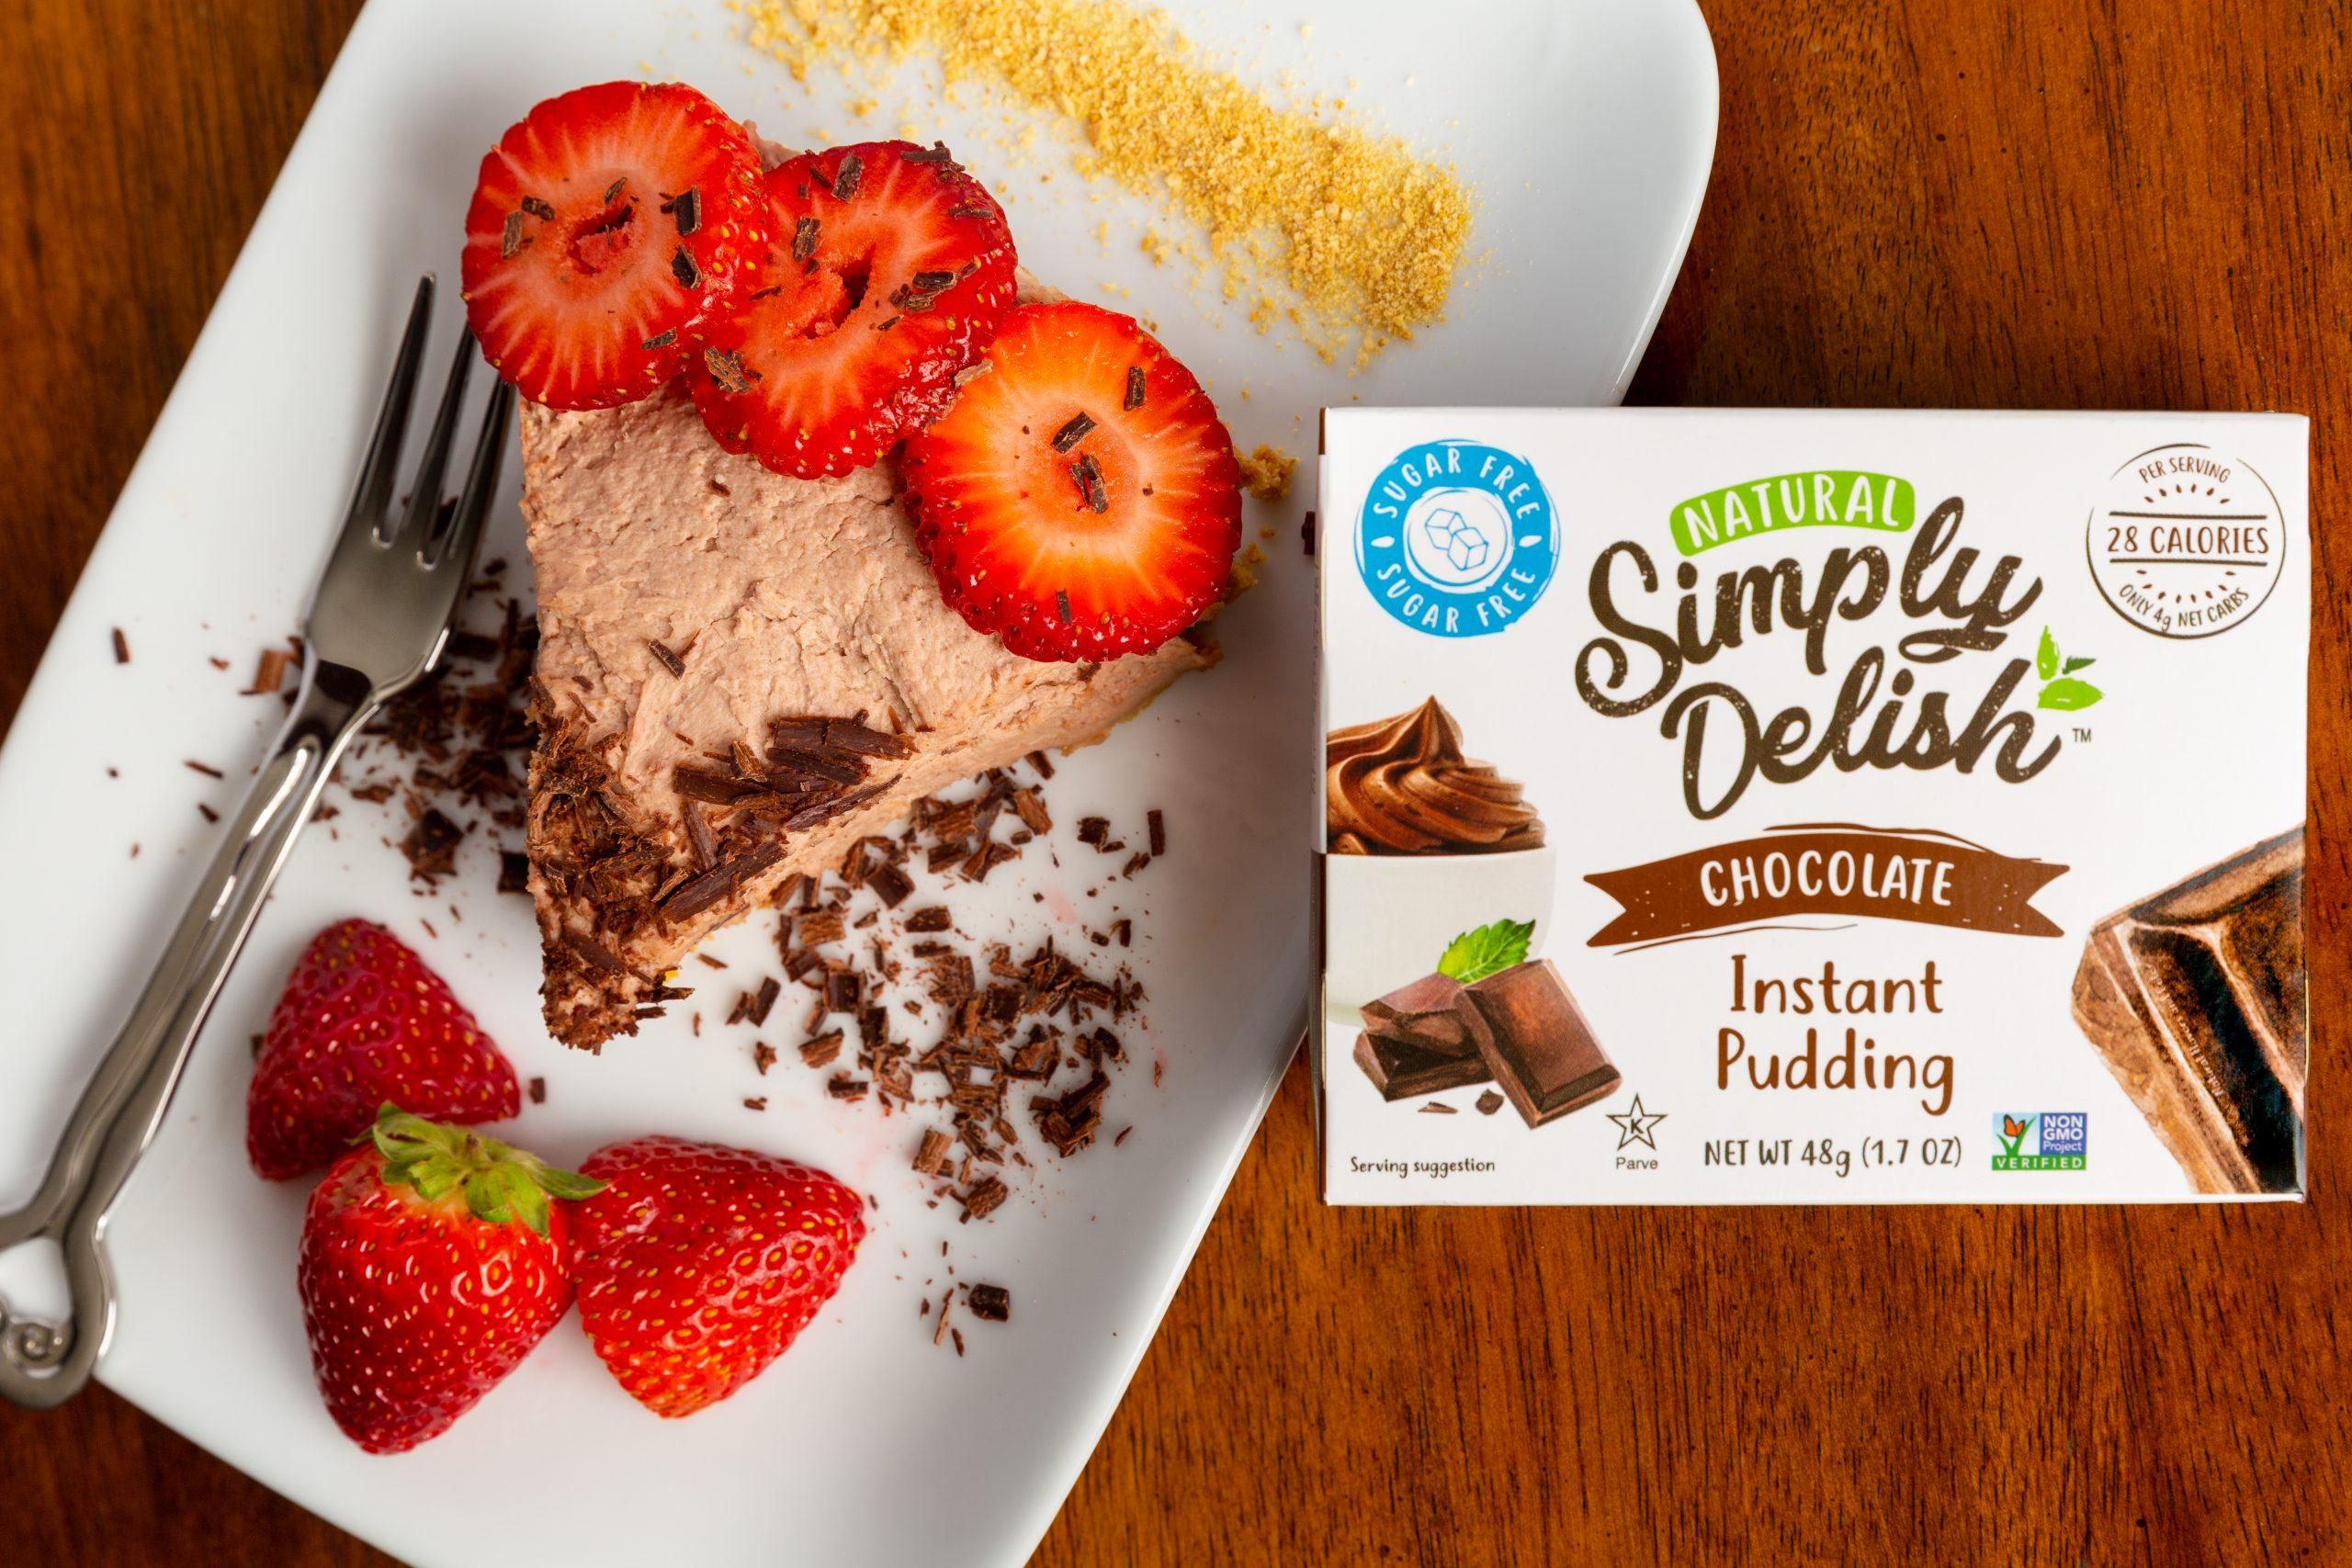 Simply Delish Chocolate Pudding Cheesecake